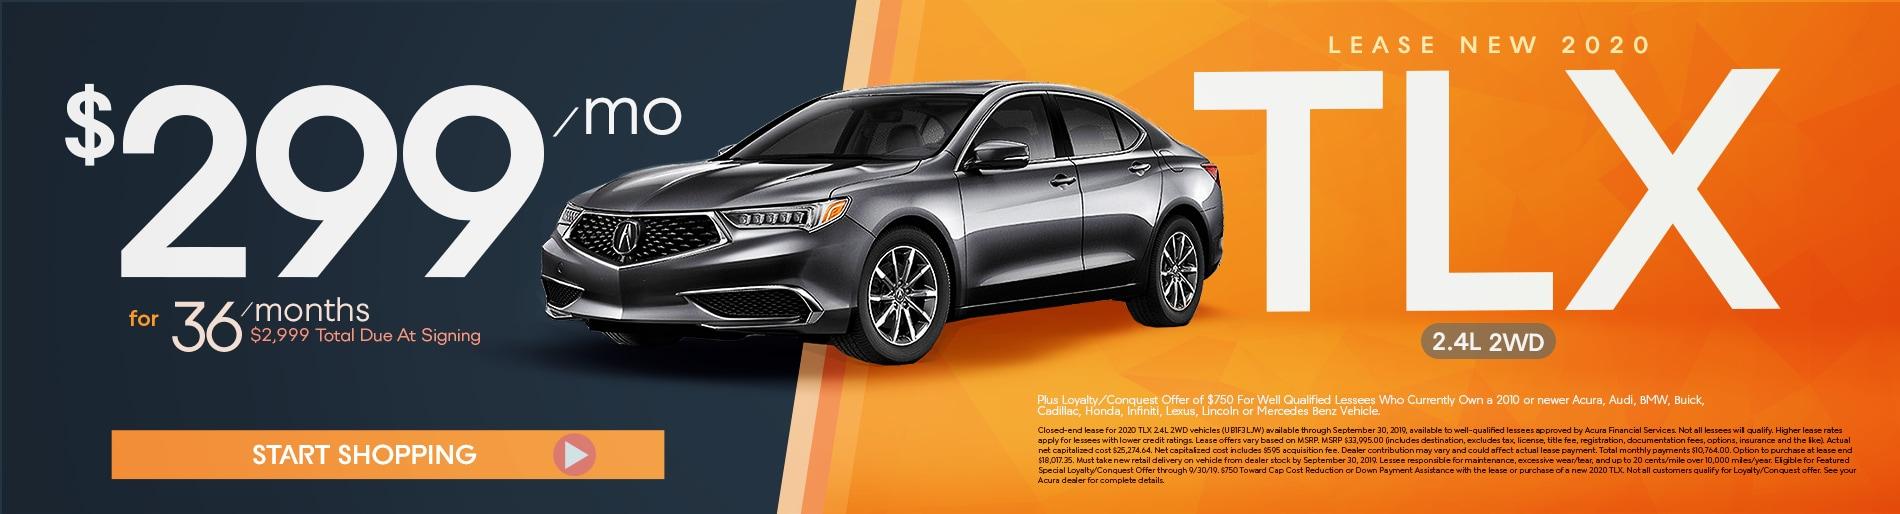 Honda Carland Service >> Honda Carland Service 2020 Upcoming Car Release